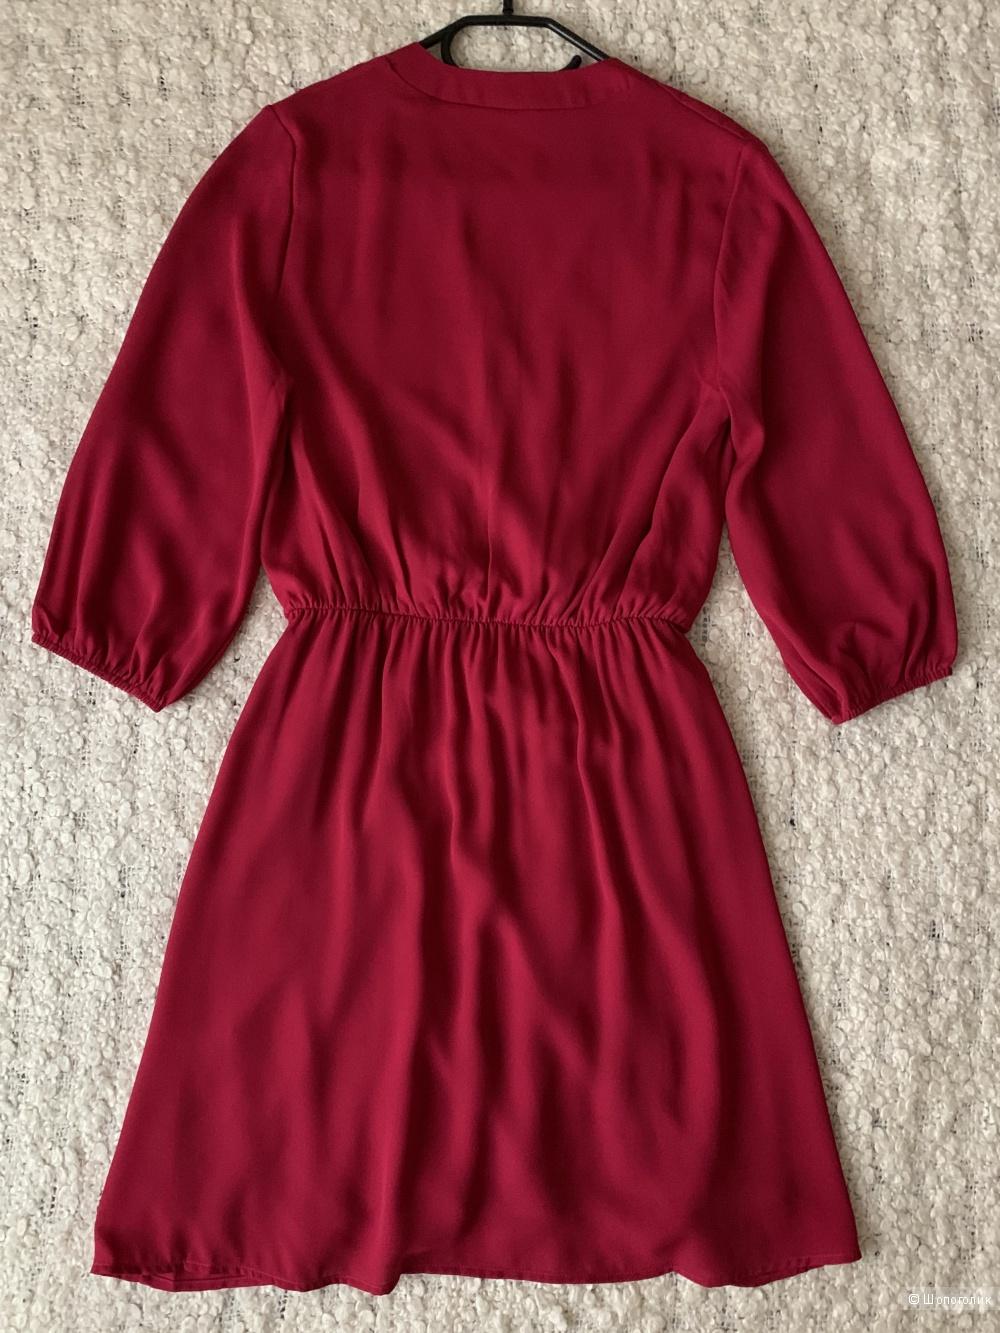 Платье «Brigitte Bailey», размер: 42